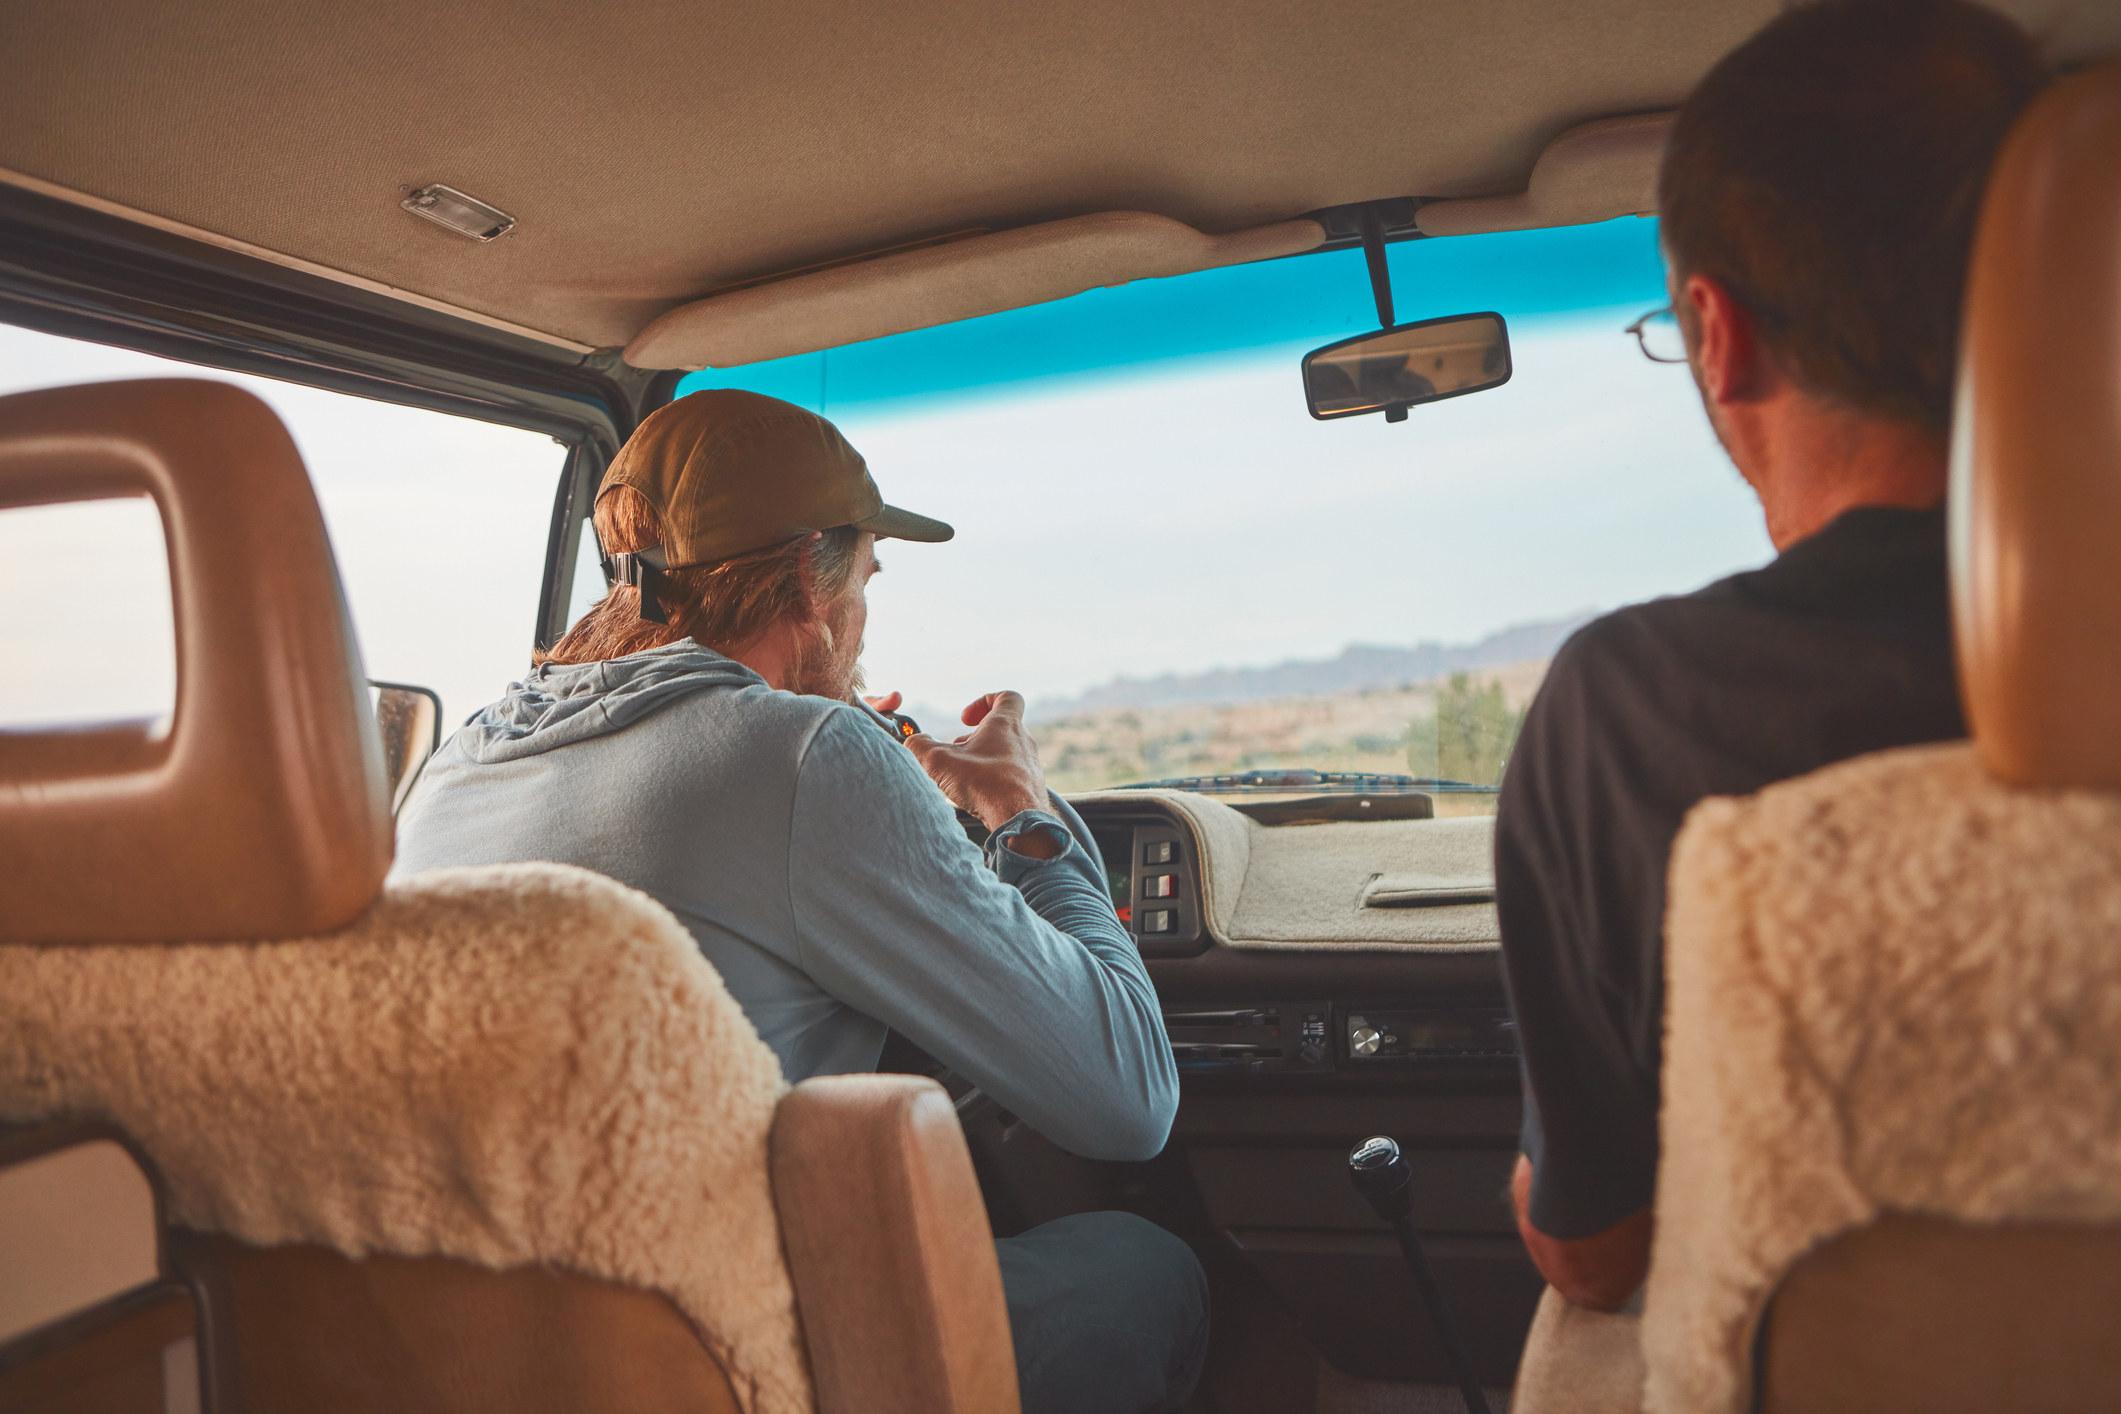 man smoking with friend in a van